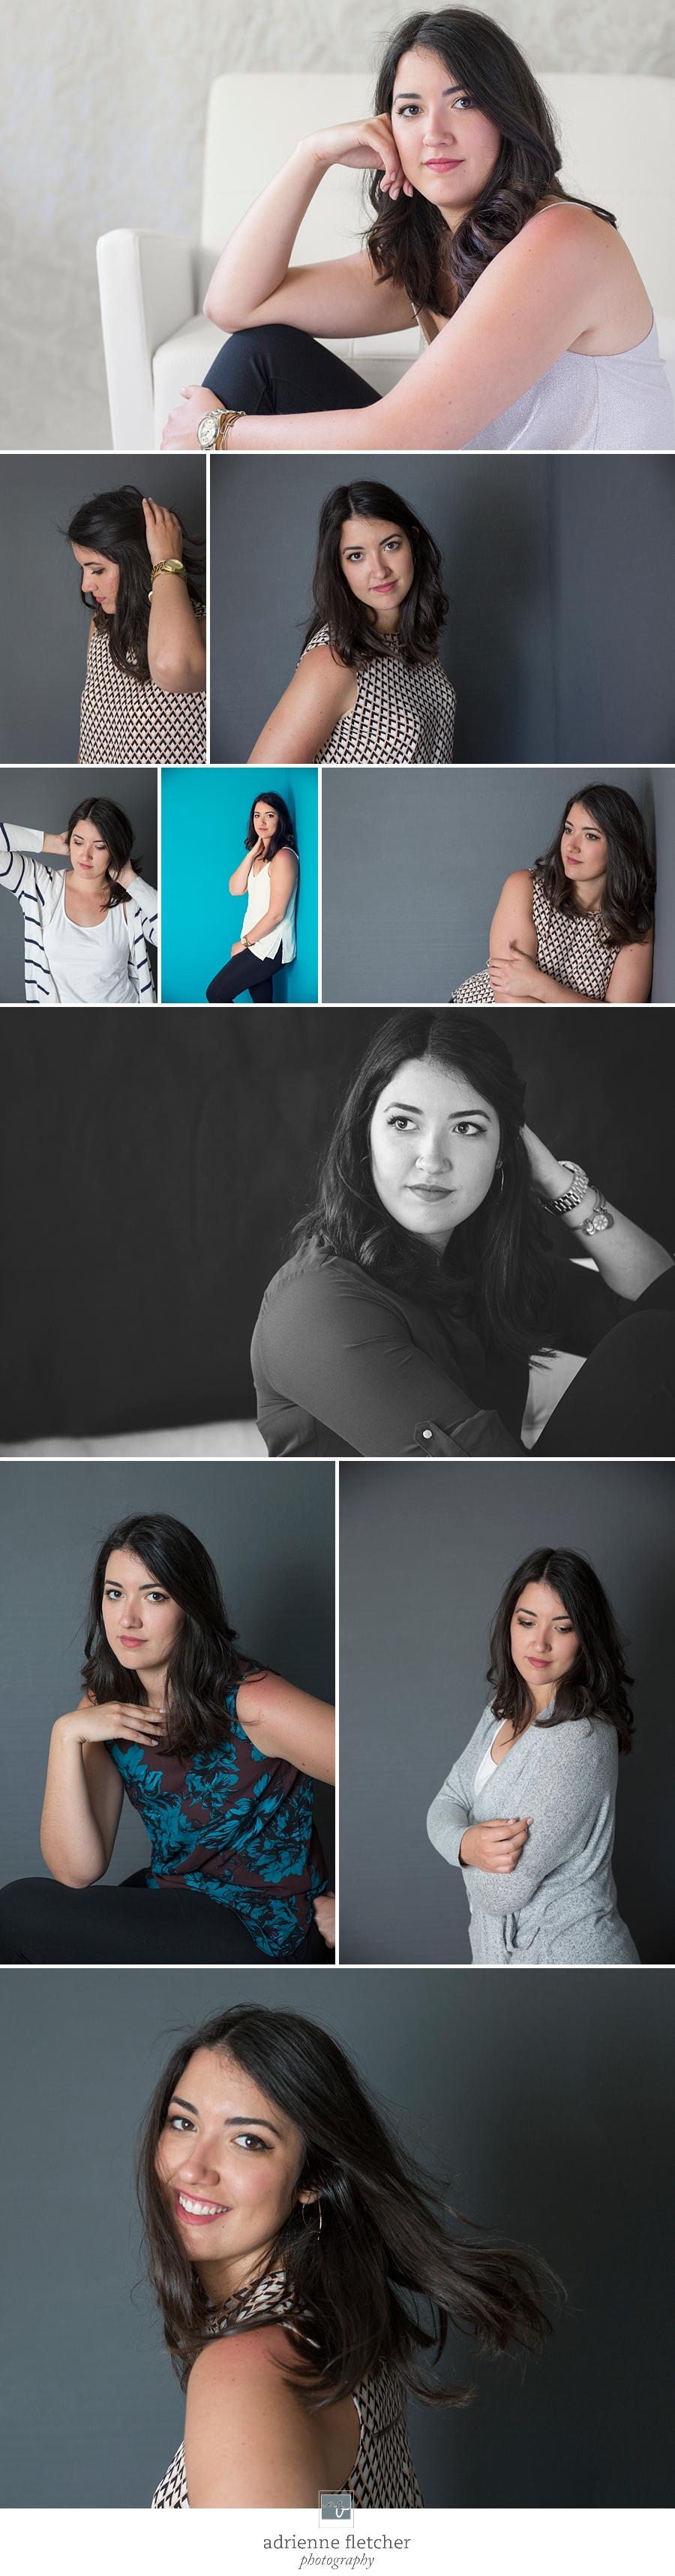 bombshell portraits of a woman